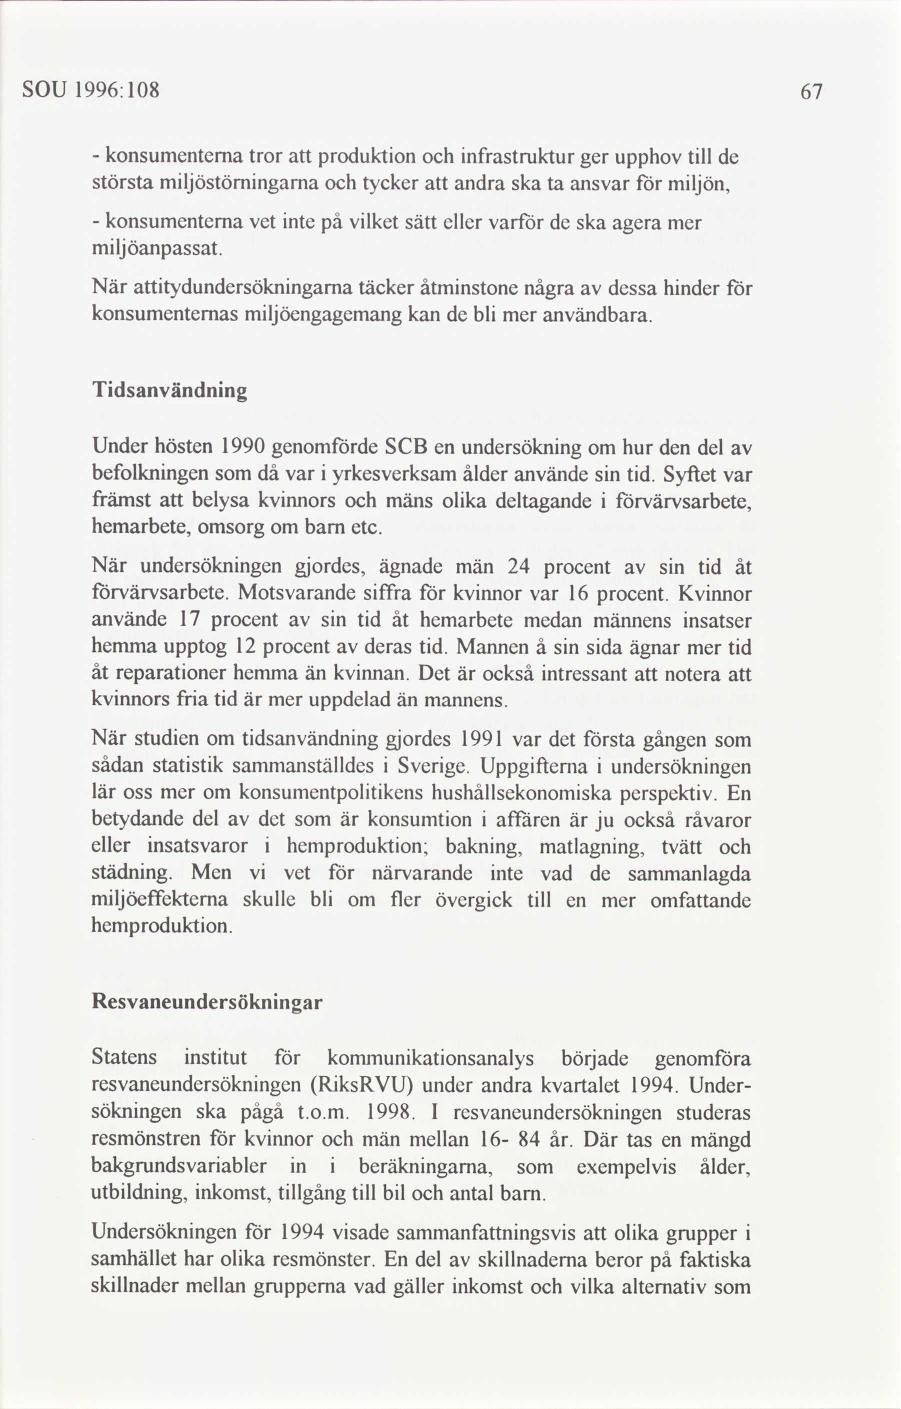 Konsumenter utan rad i stockholm